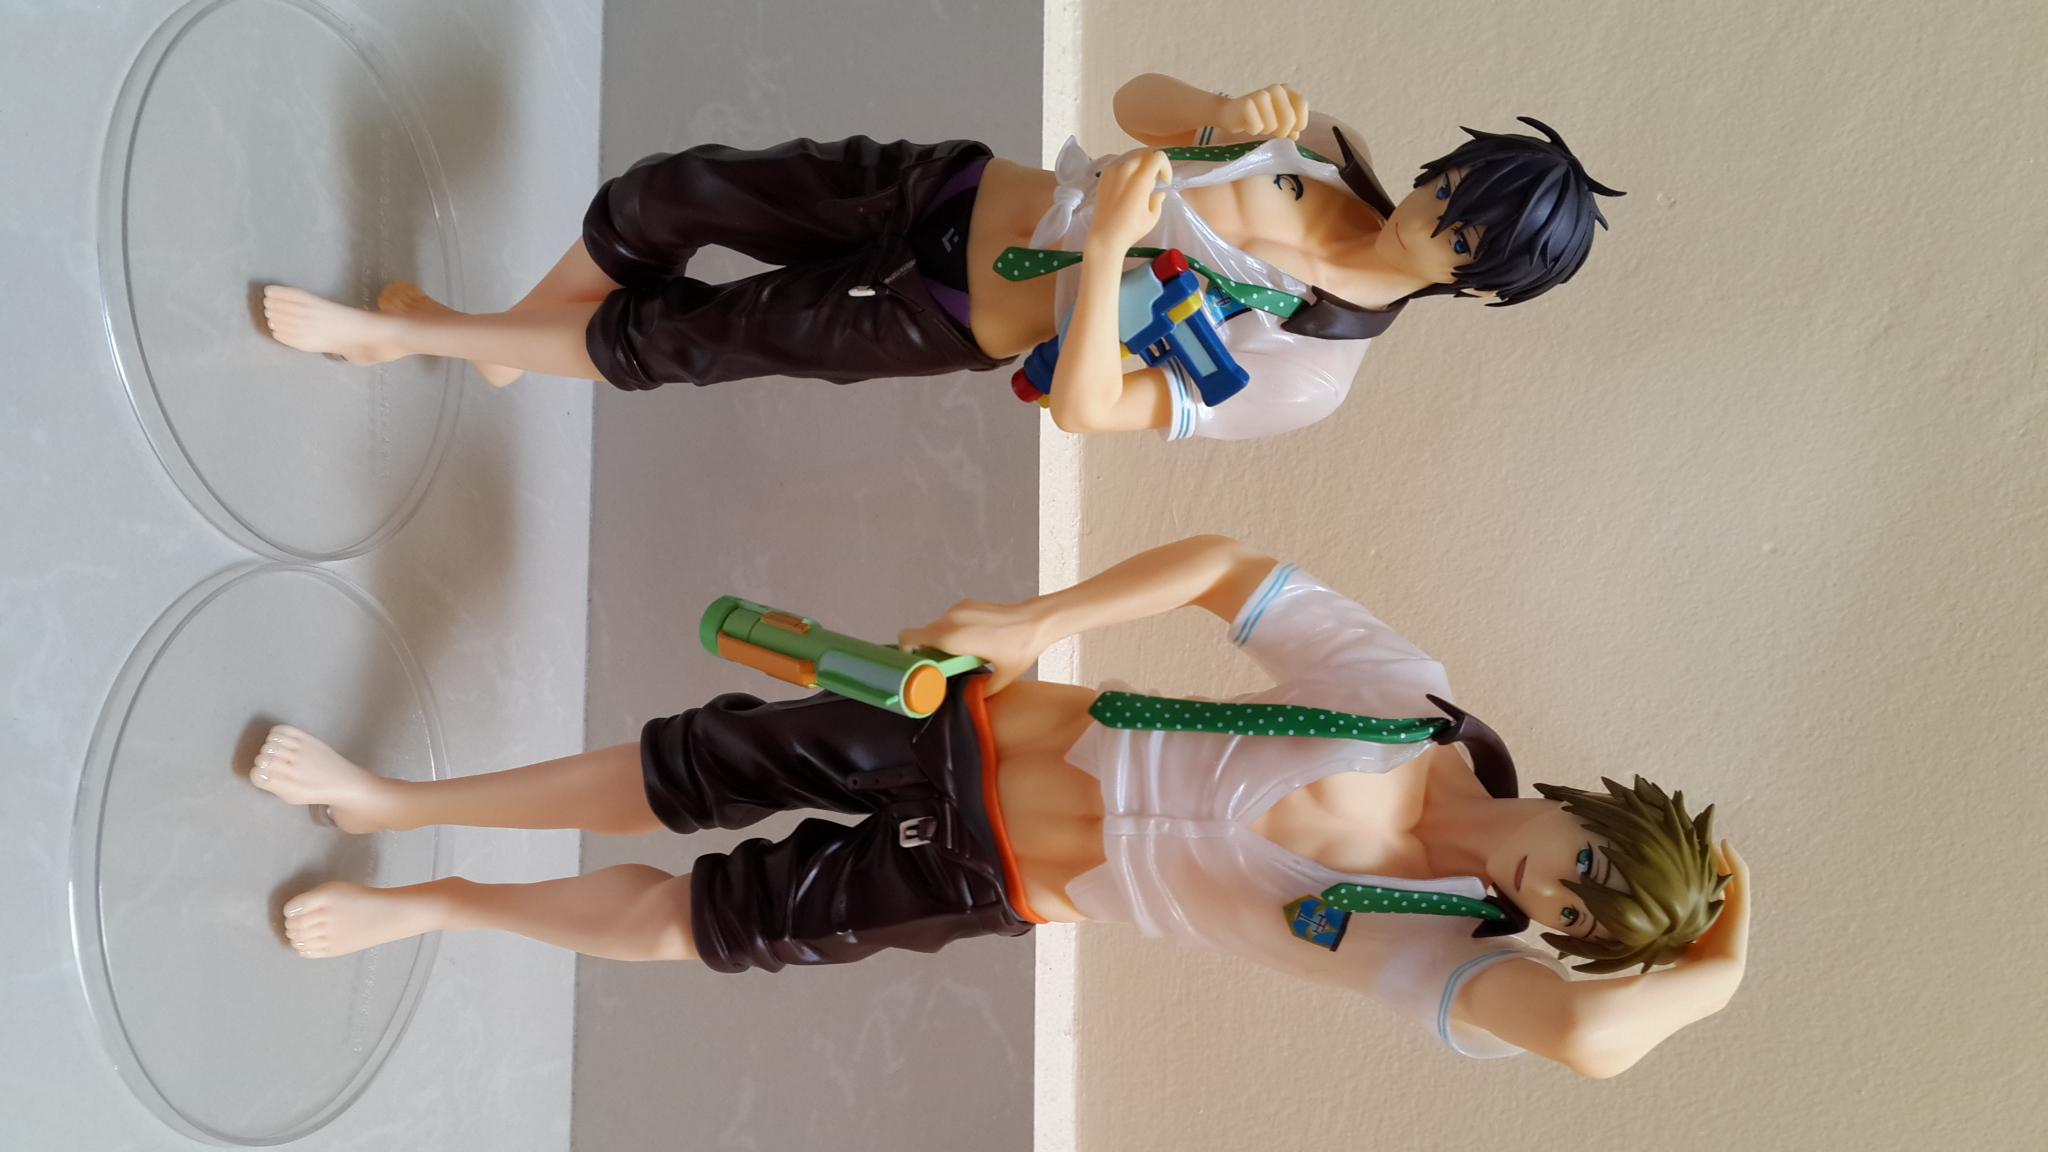 toy's_works nanase_haruka tachibana_makoto free!_-eternal_summer- sato kohirou